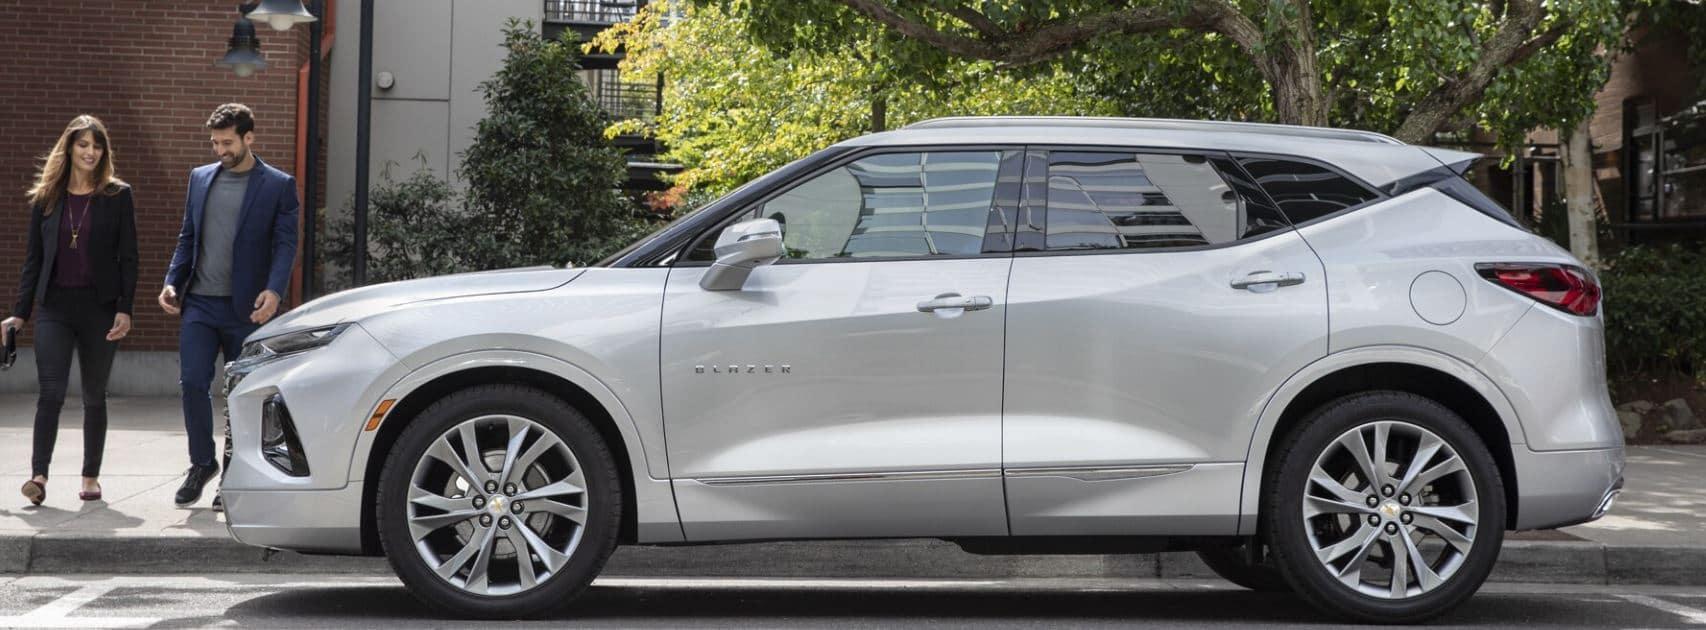 2020 Chevy Blazer Exterior